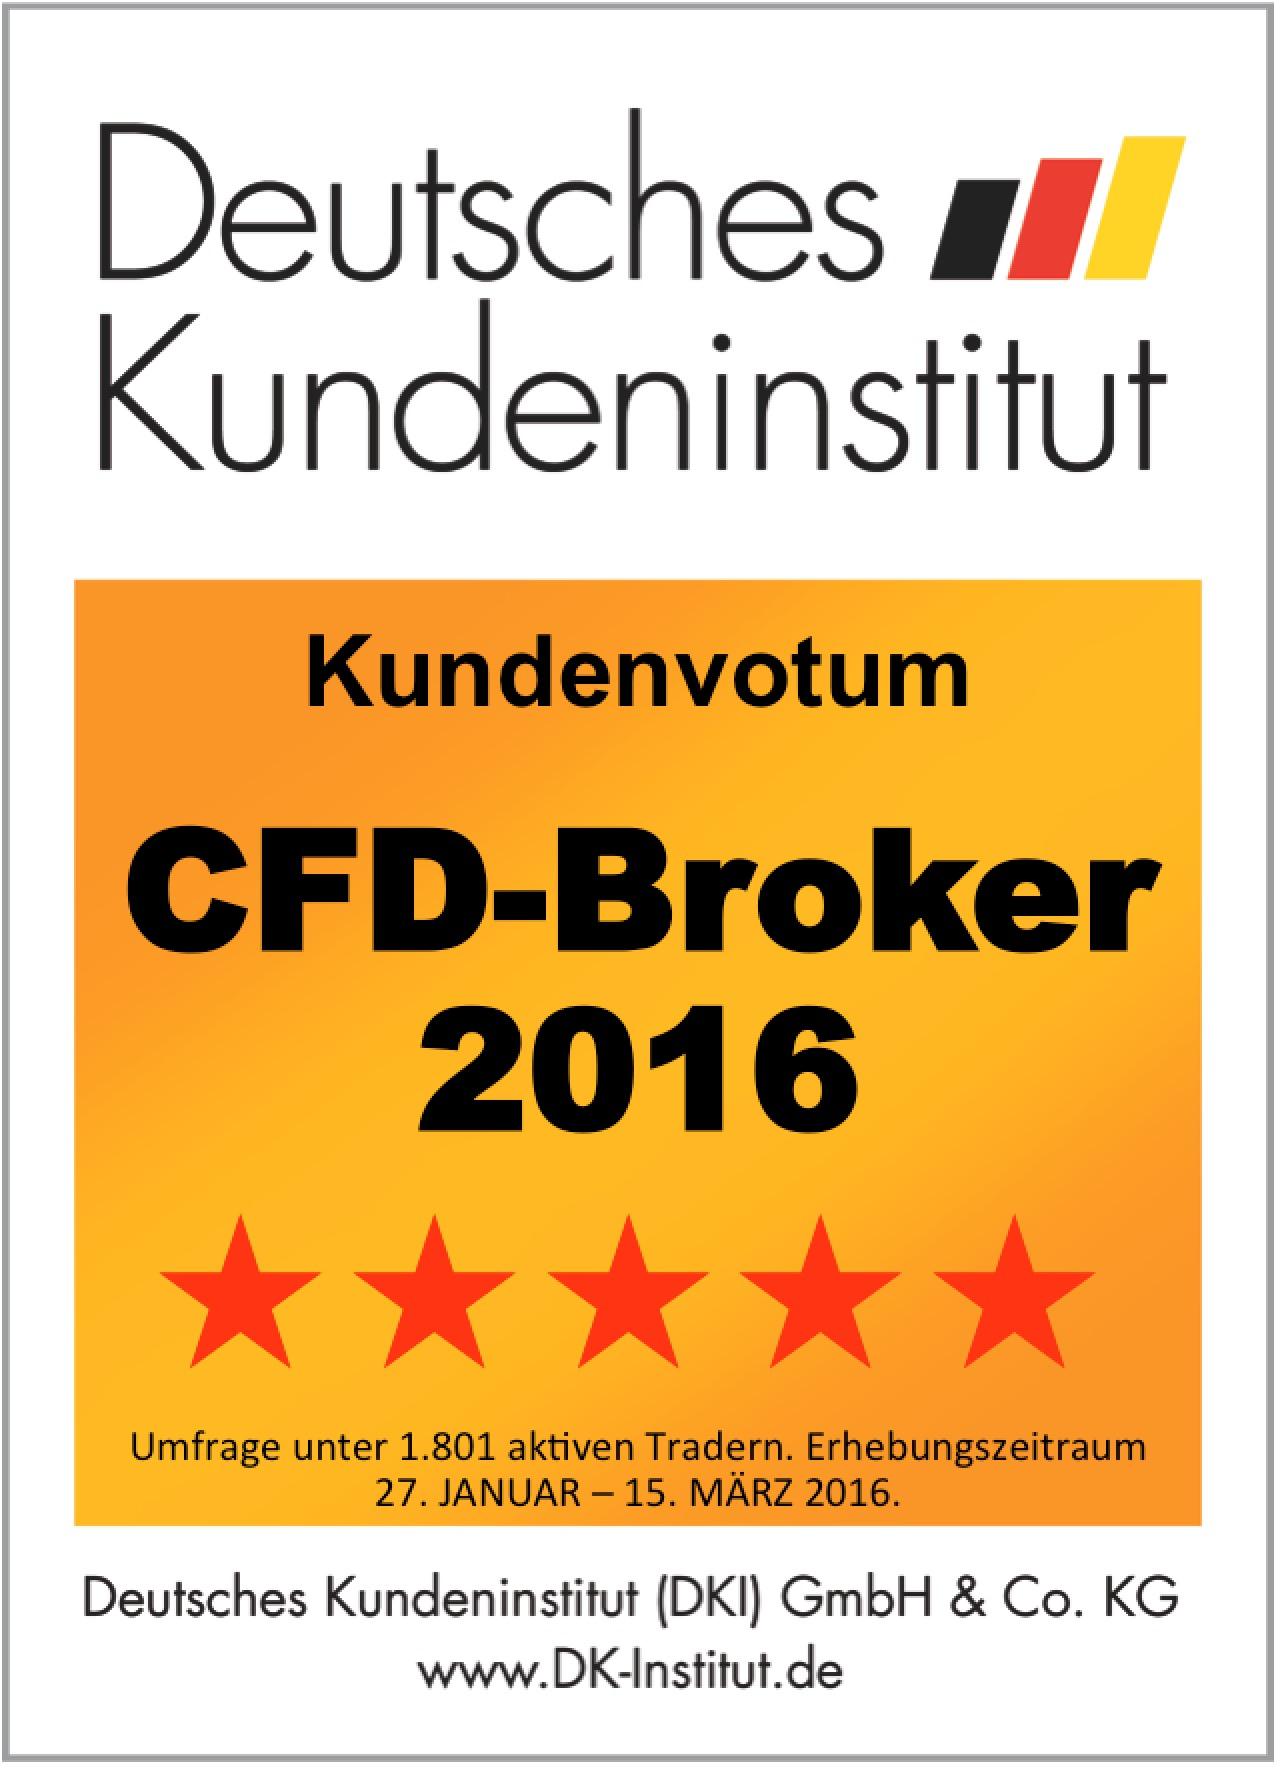 Bester CFD-Broker 2016 laut dem Deutschen Kundeninstitut: Admiral Markets